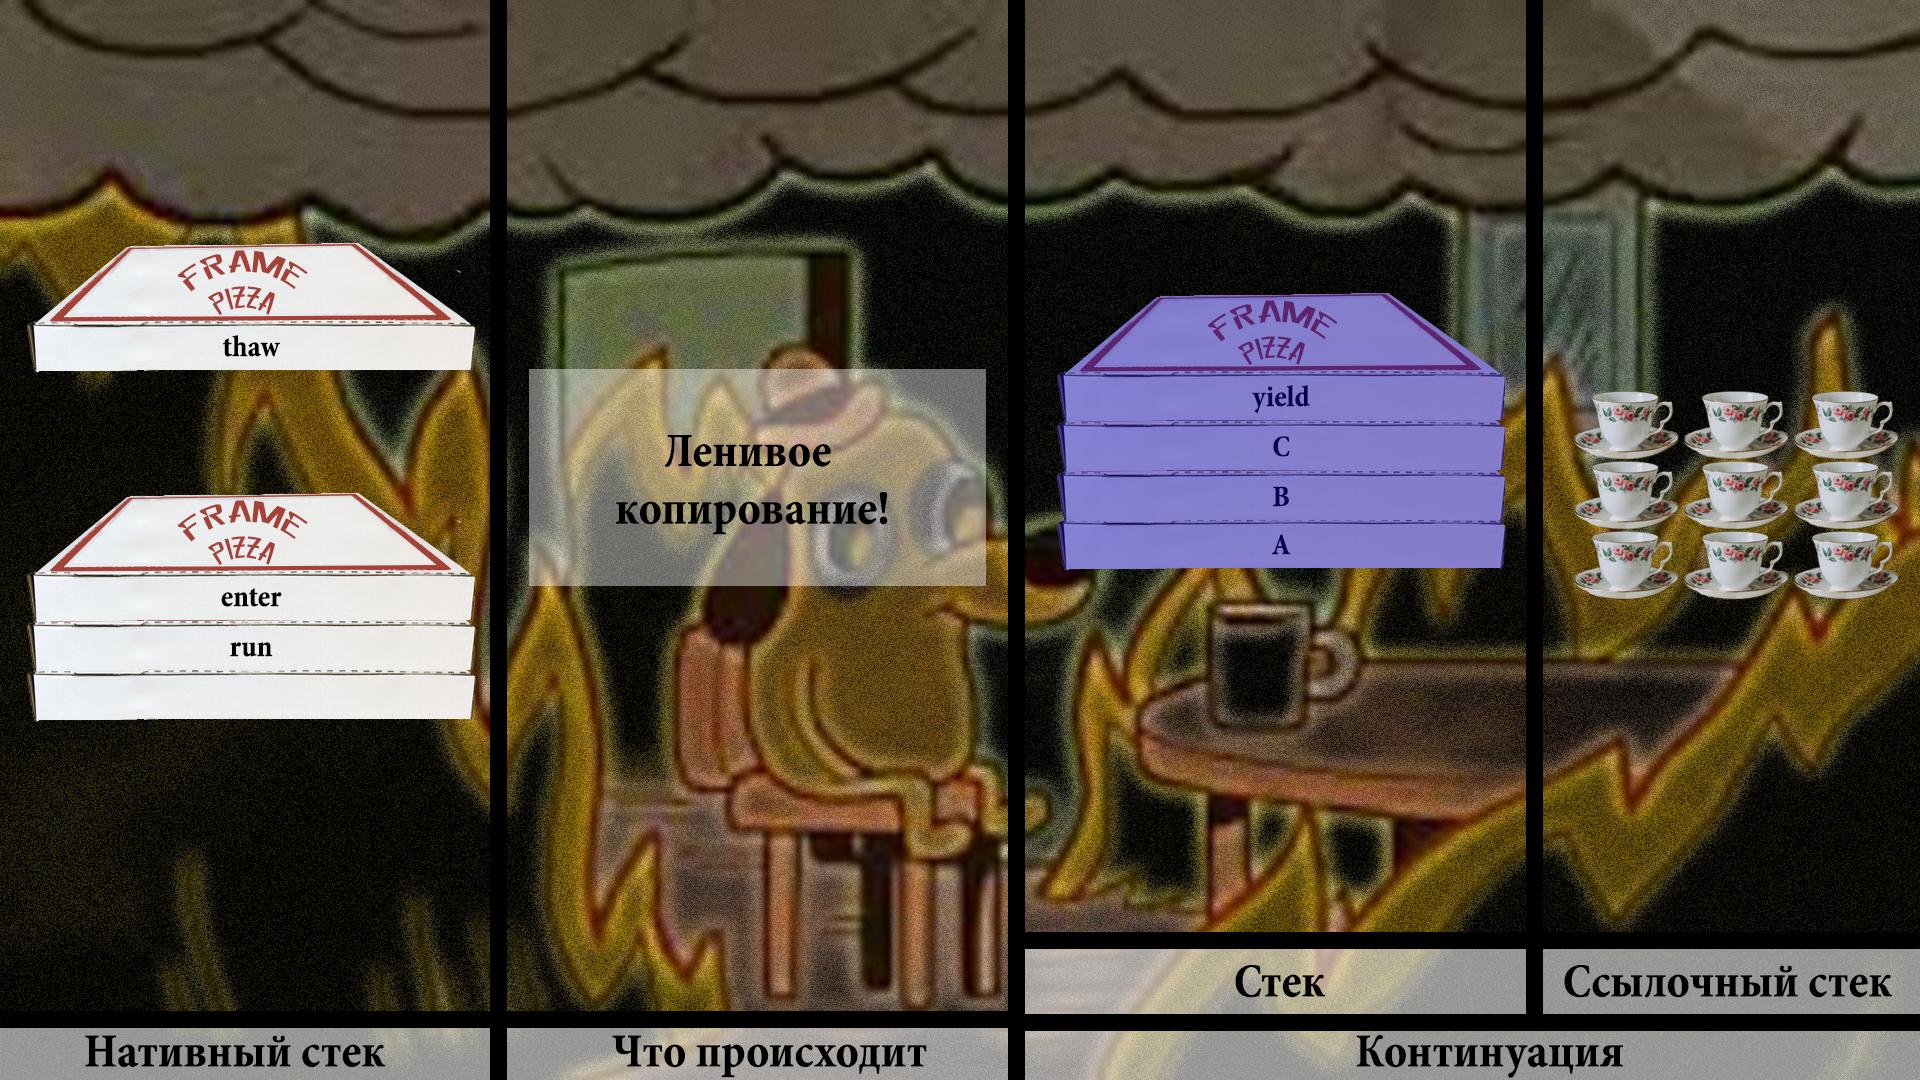 nmolowac-dkmdefuobd-kaijyeq.png